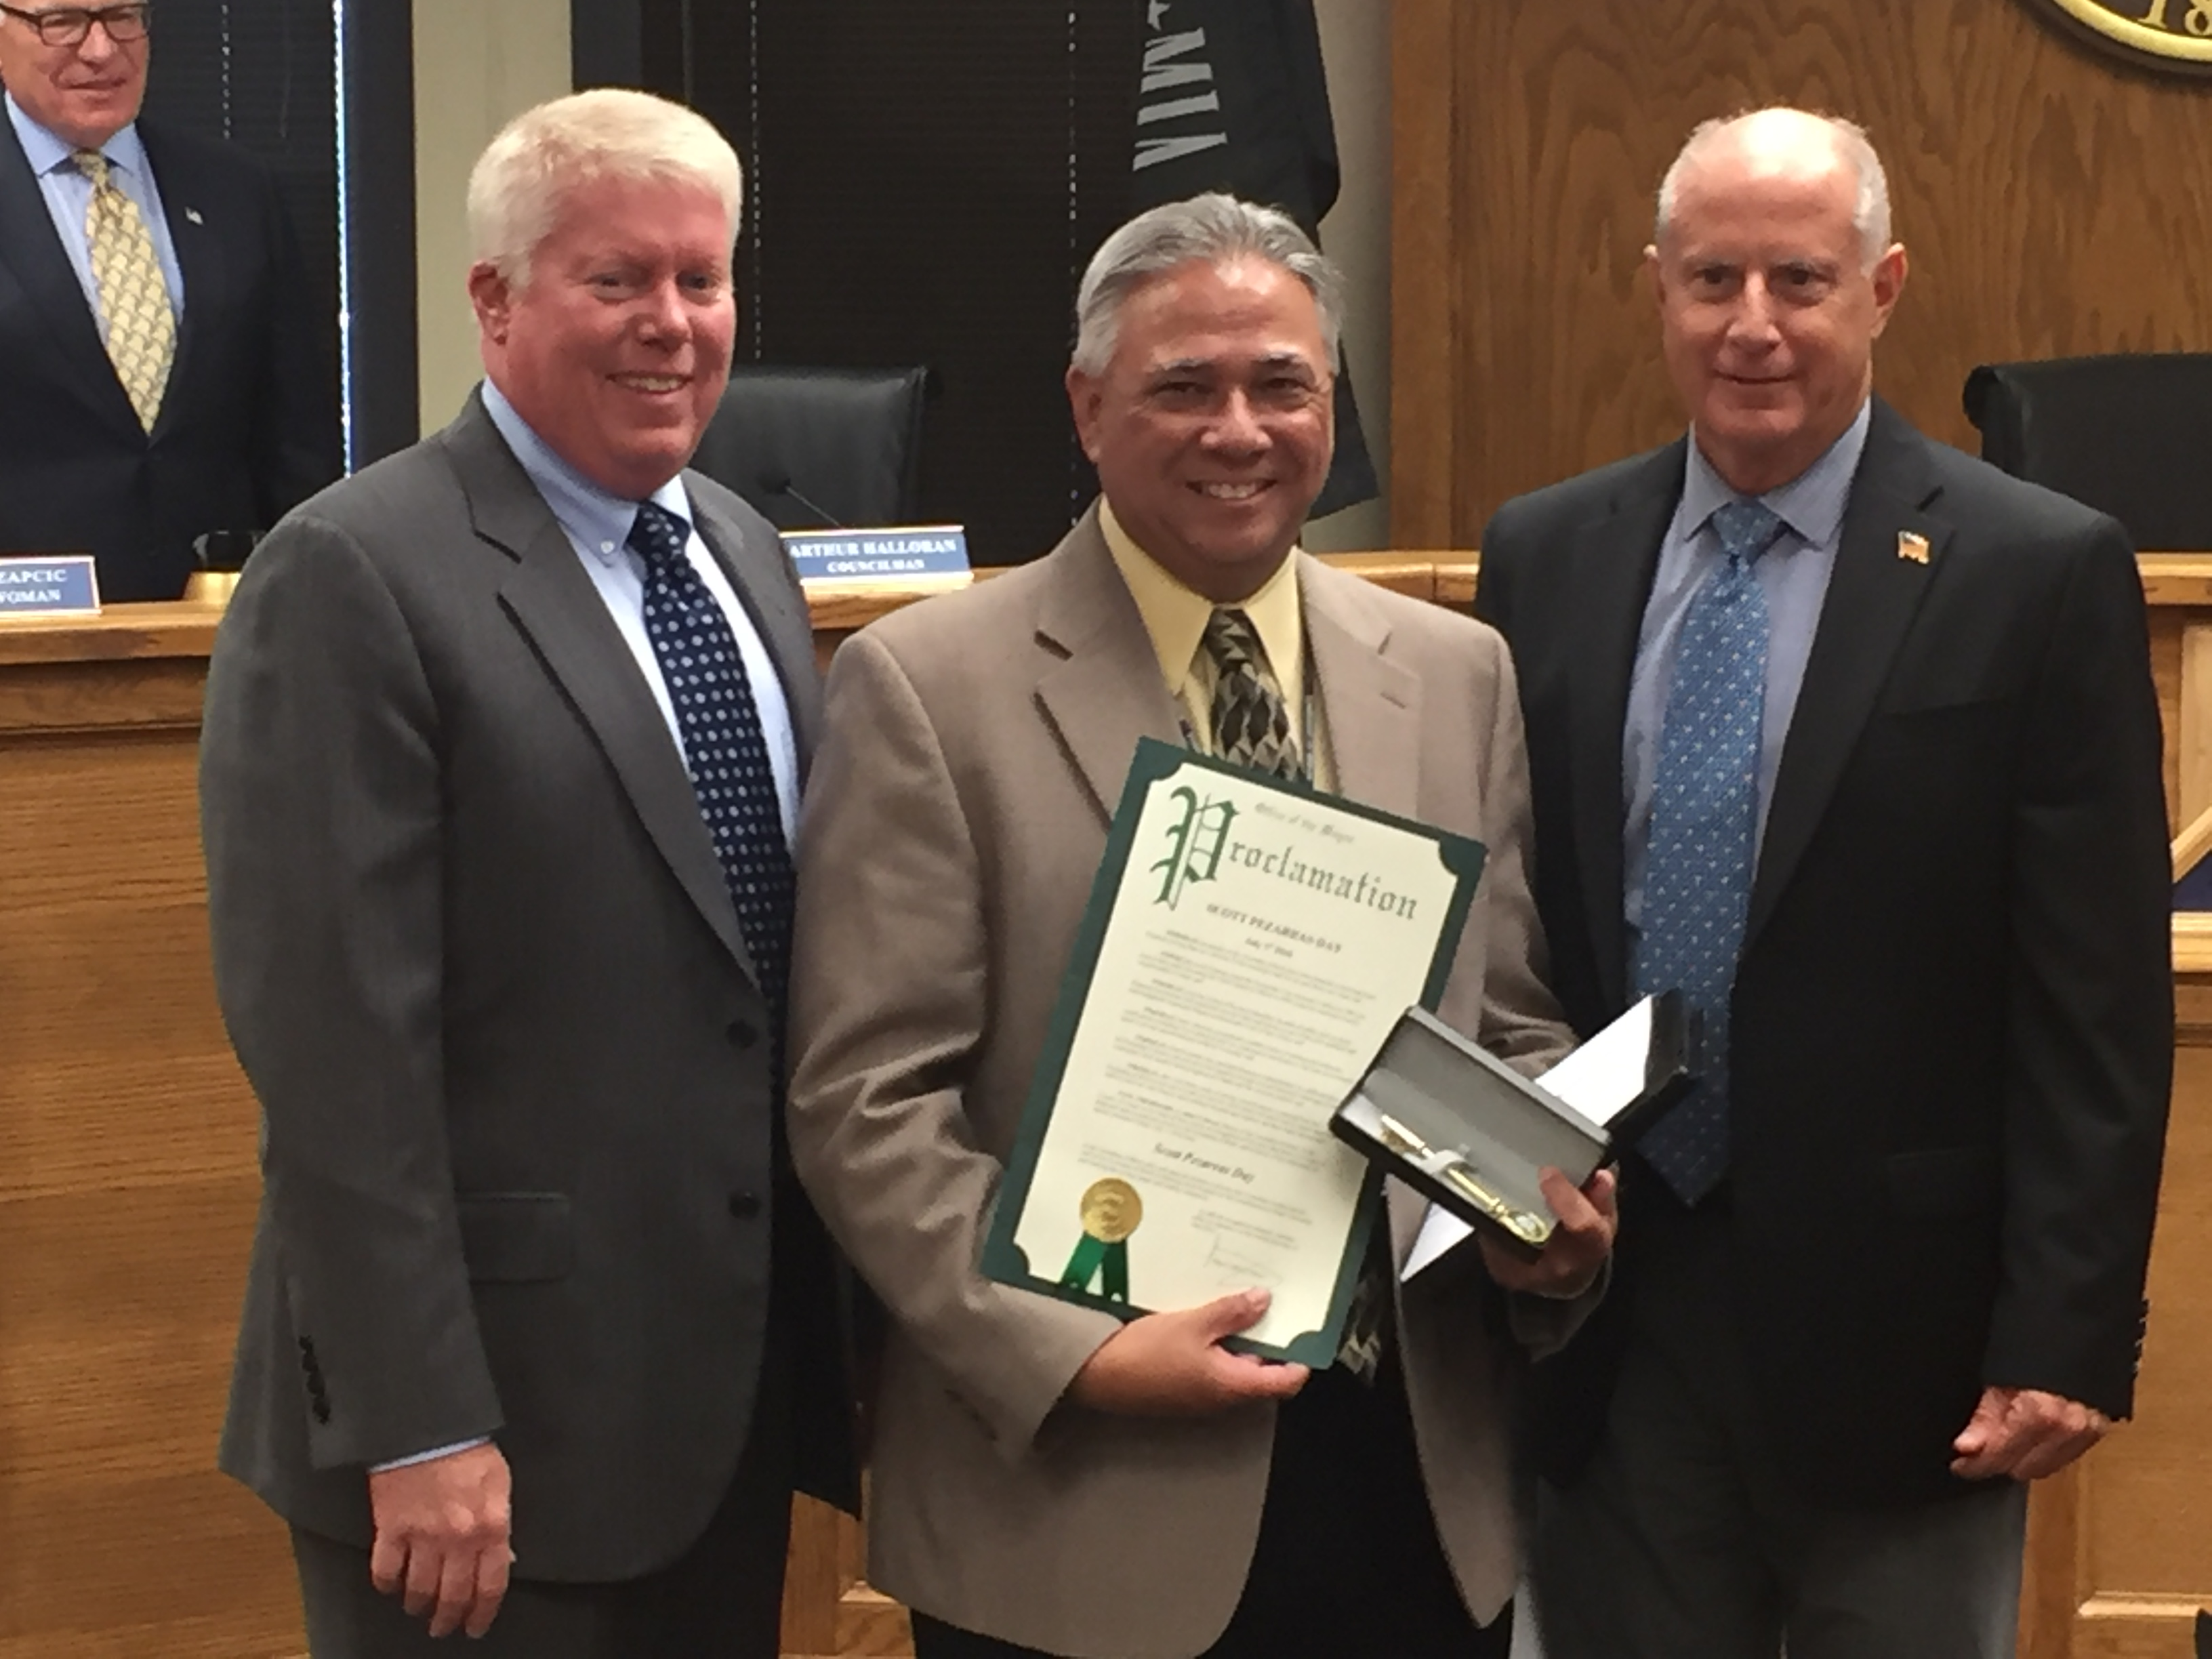 Scott Pezarras receives proclamations from Mayor John Ducey (left) and Council President Paul Mummolo (right). (Photo: Daniel Nee)